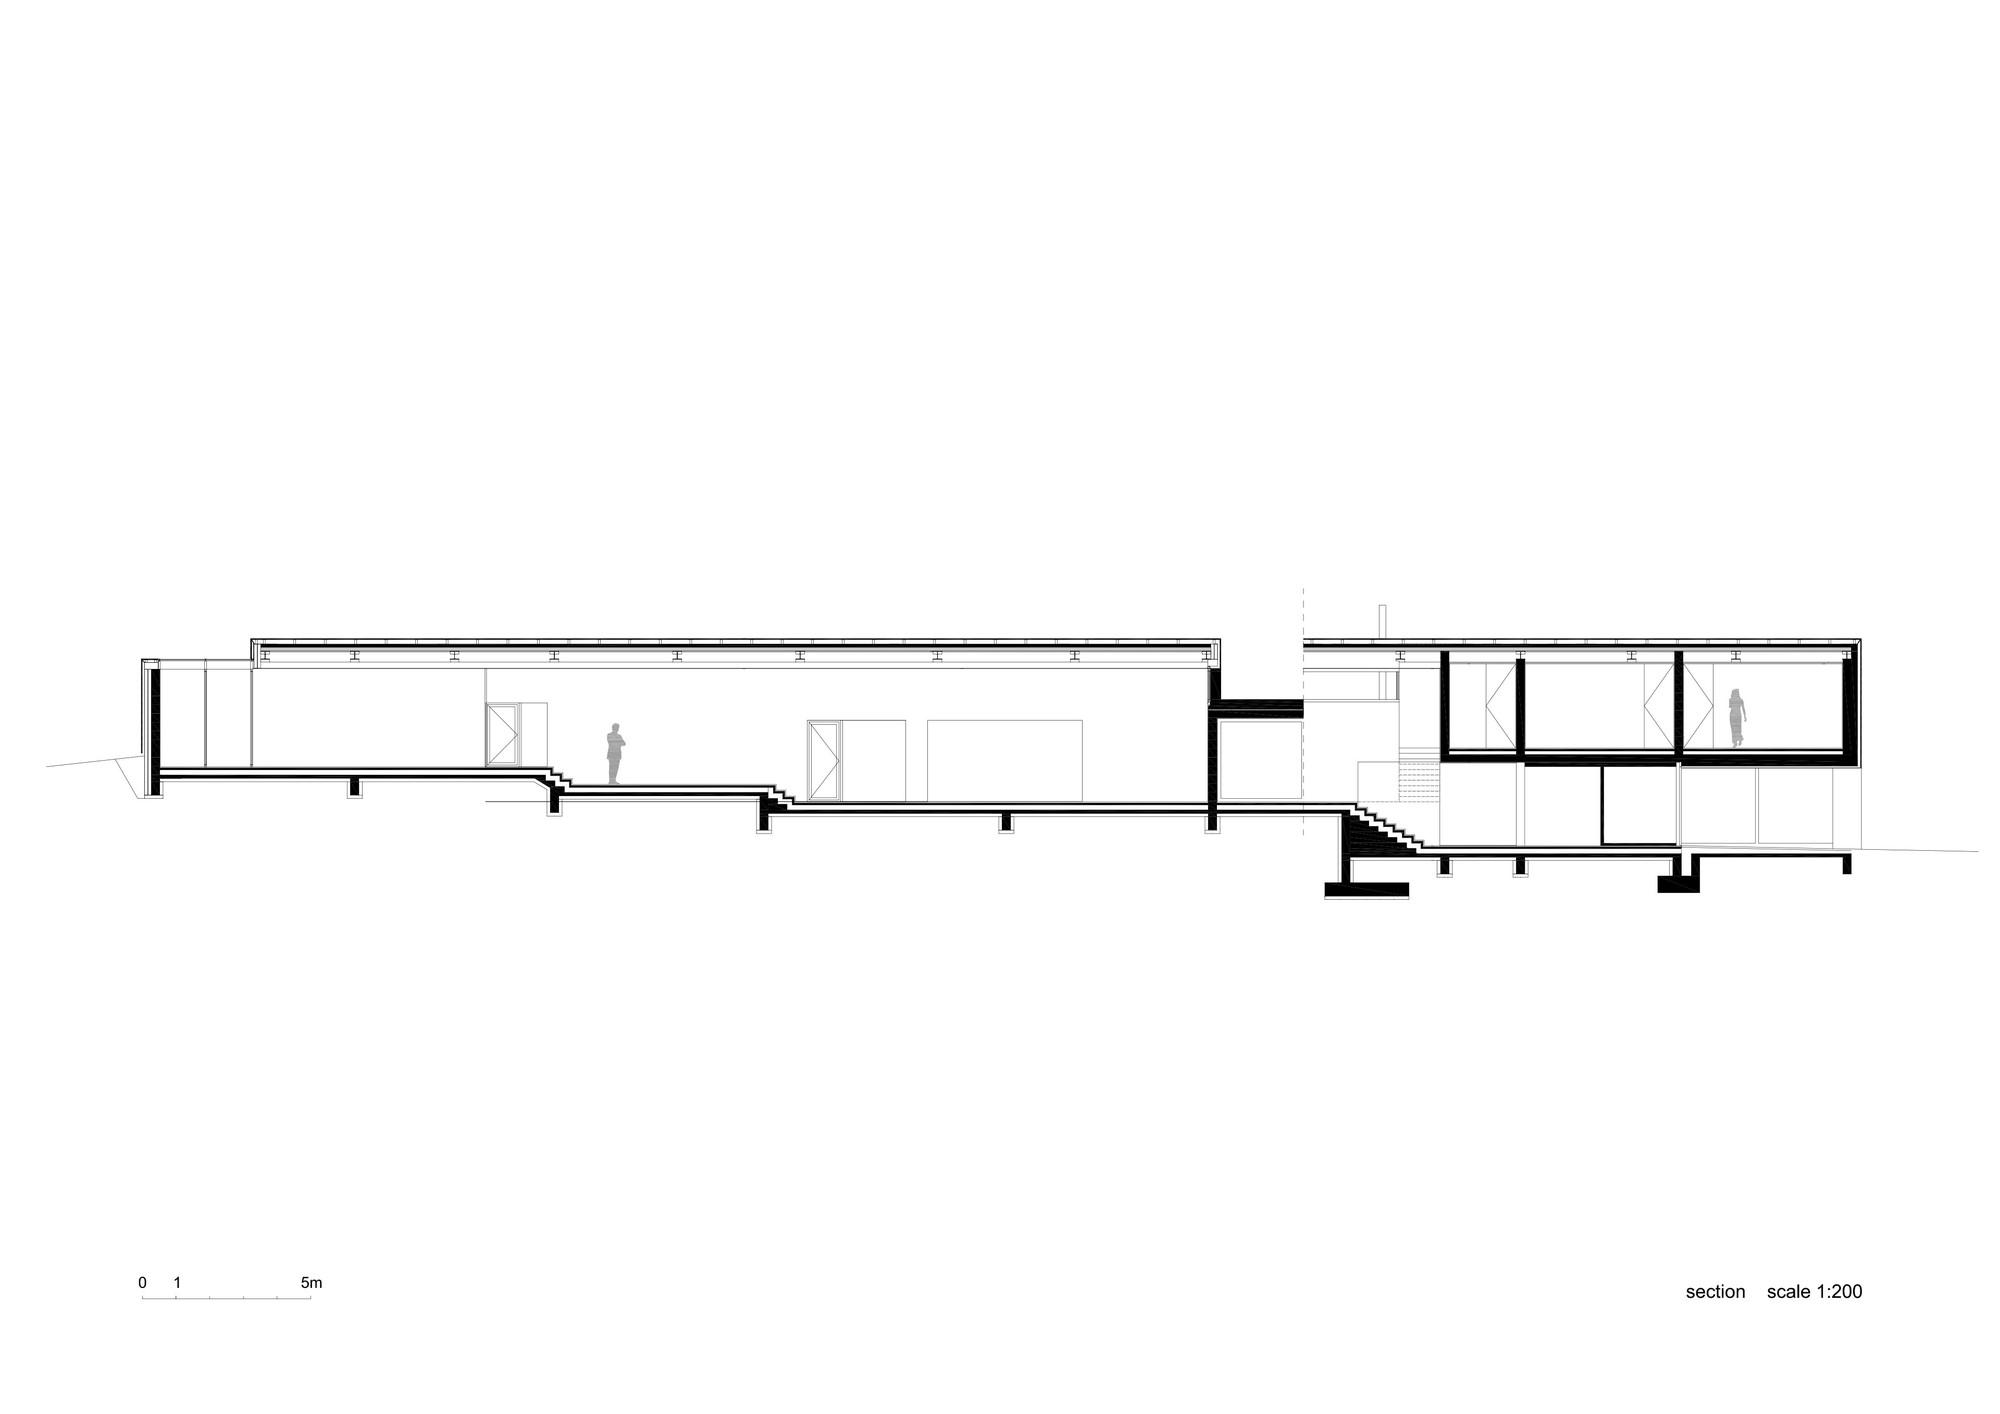 Gallery of Slight Slope Long House / I/O Architects - 20: www.archdaily.com/602515/slight-slope-long-house-i-o-architects...